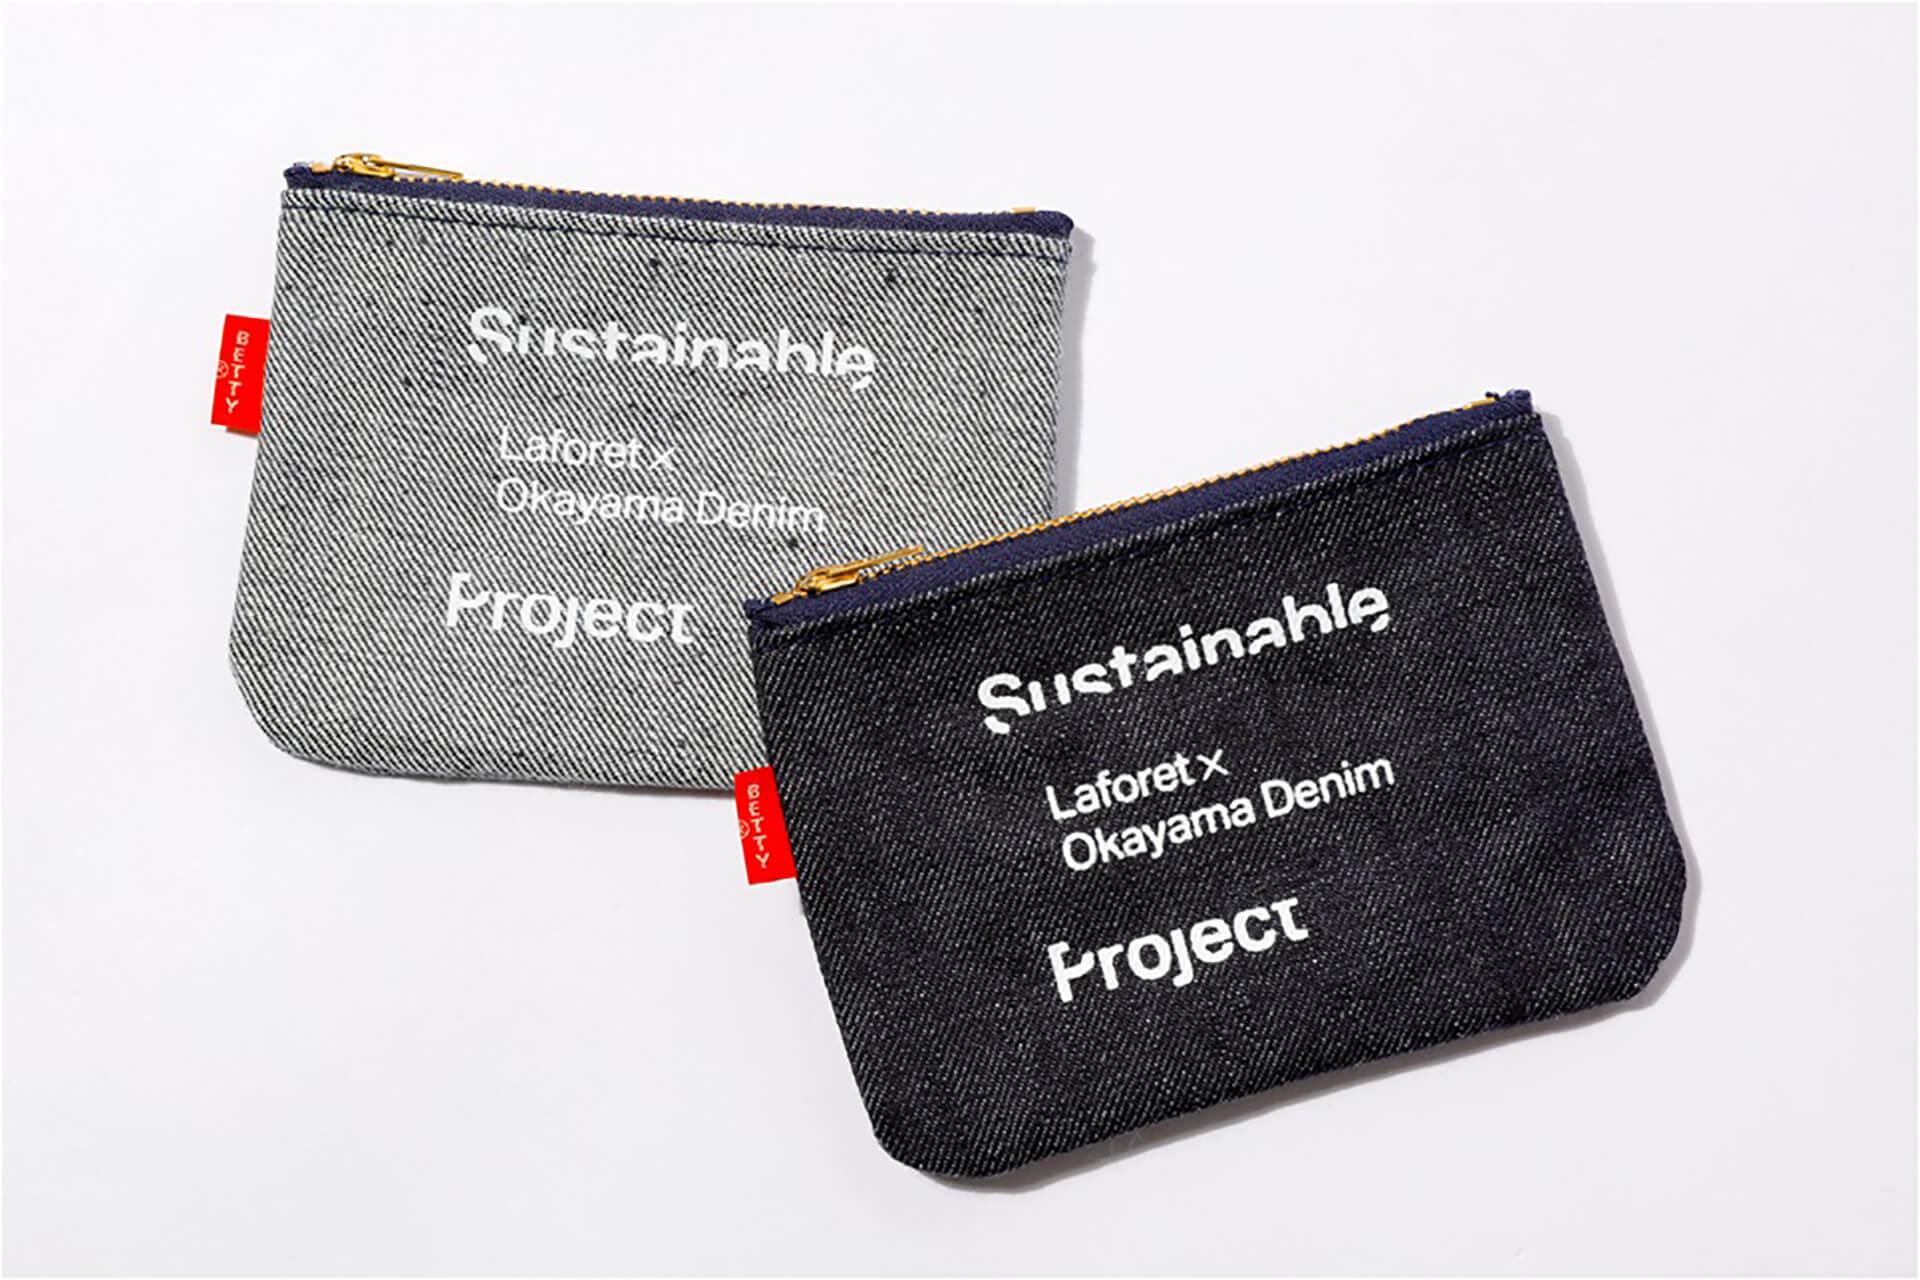 Sustainable Project Laforet×Okayama Denim・プレゼント品